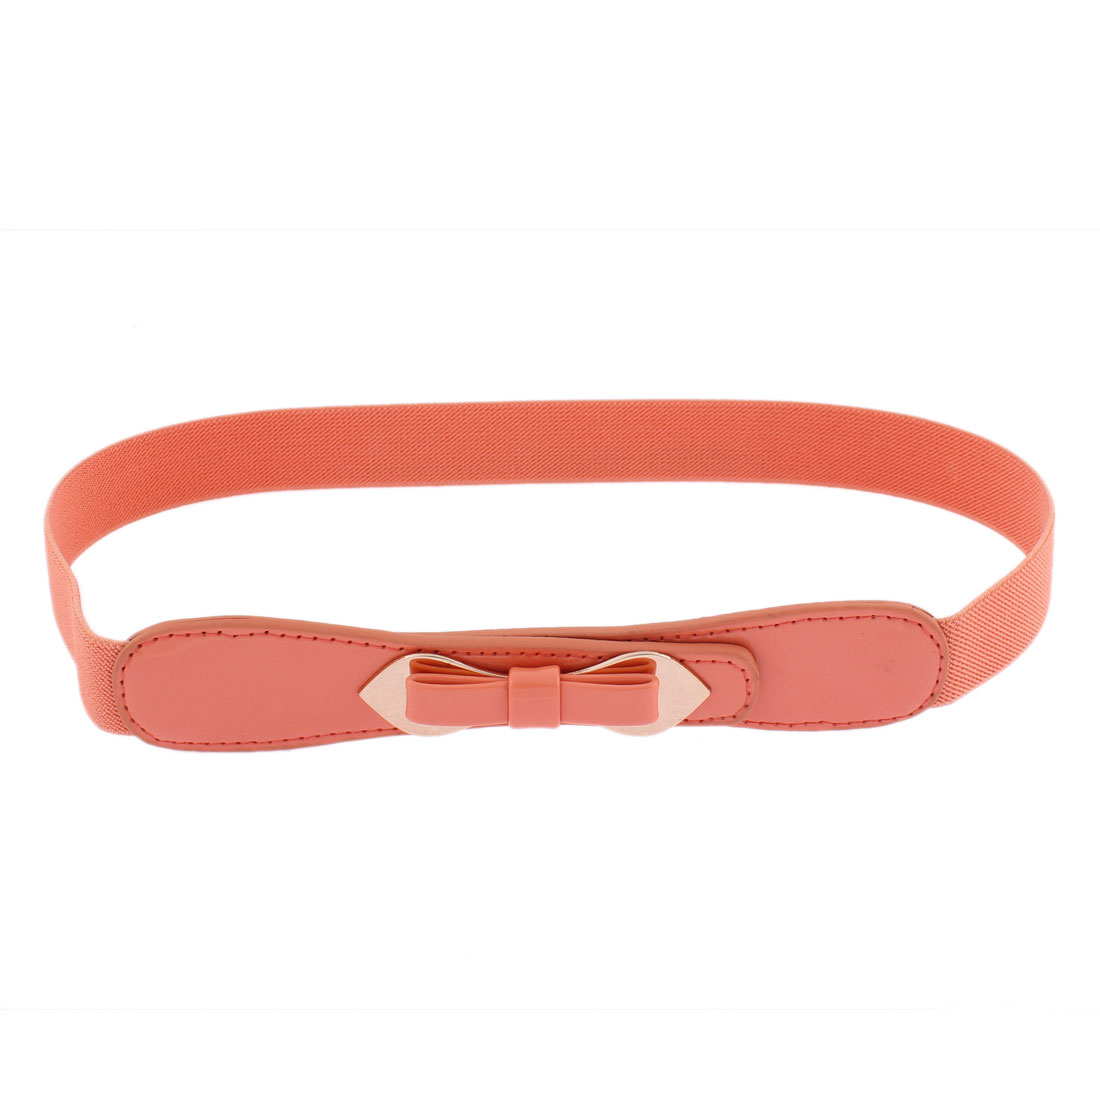 Double Pin Buckle Adjustable Elastic Waistband Waist Belt Coral Pink